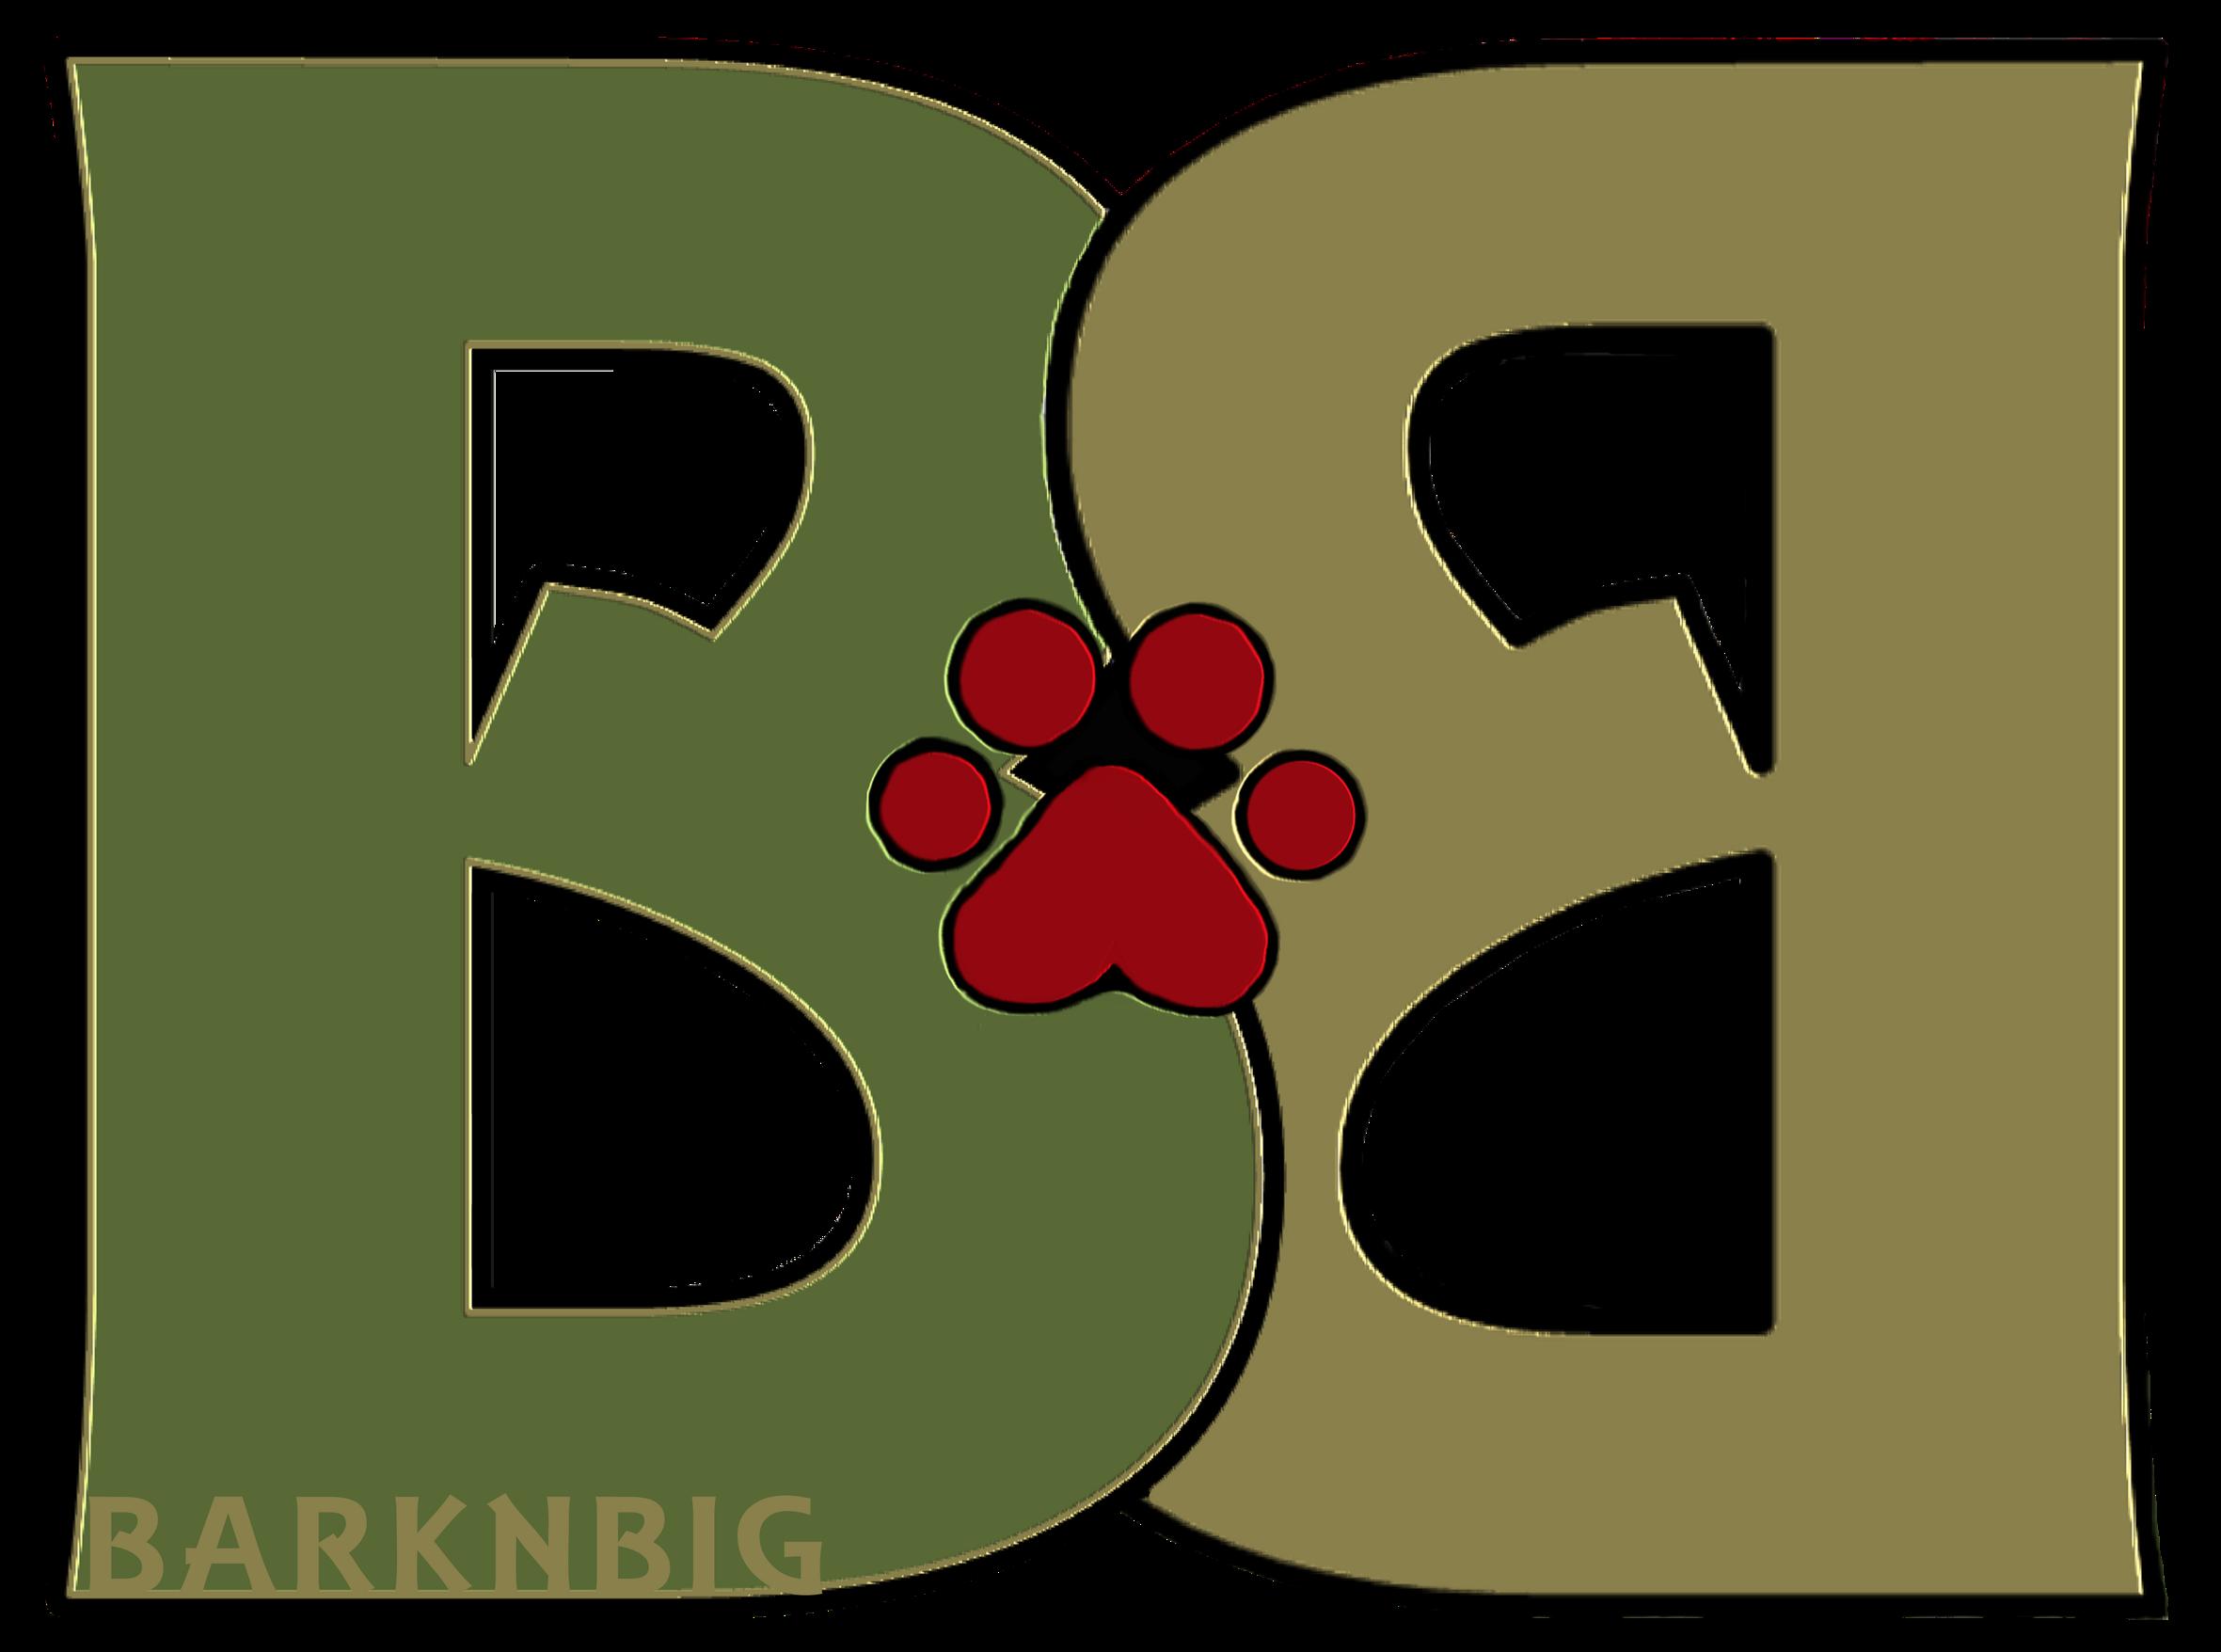 Barknbig